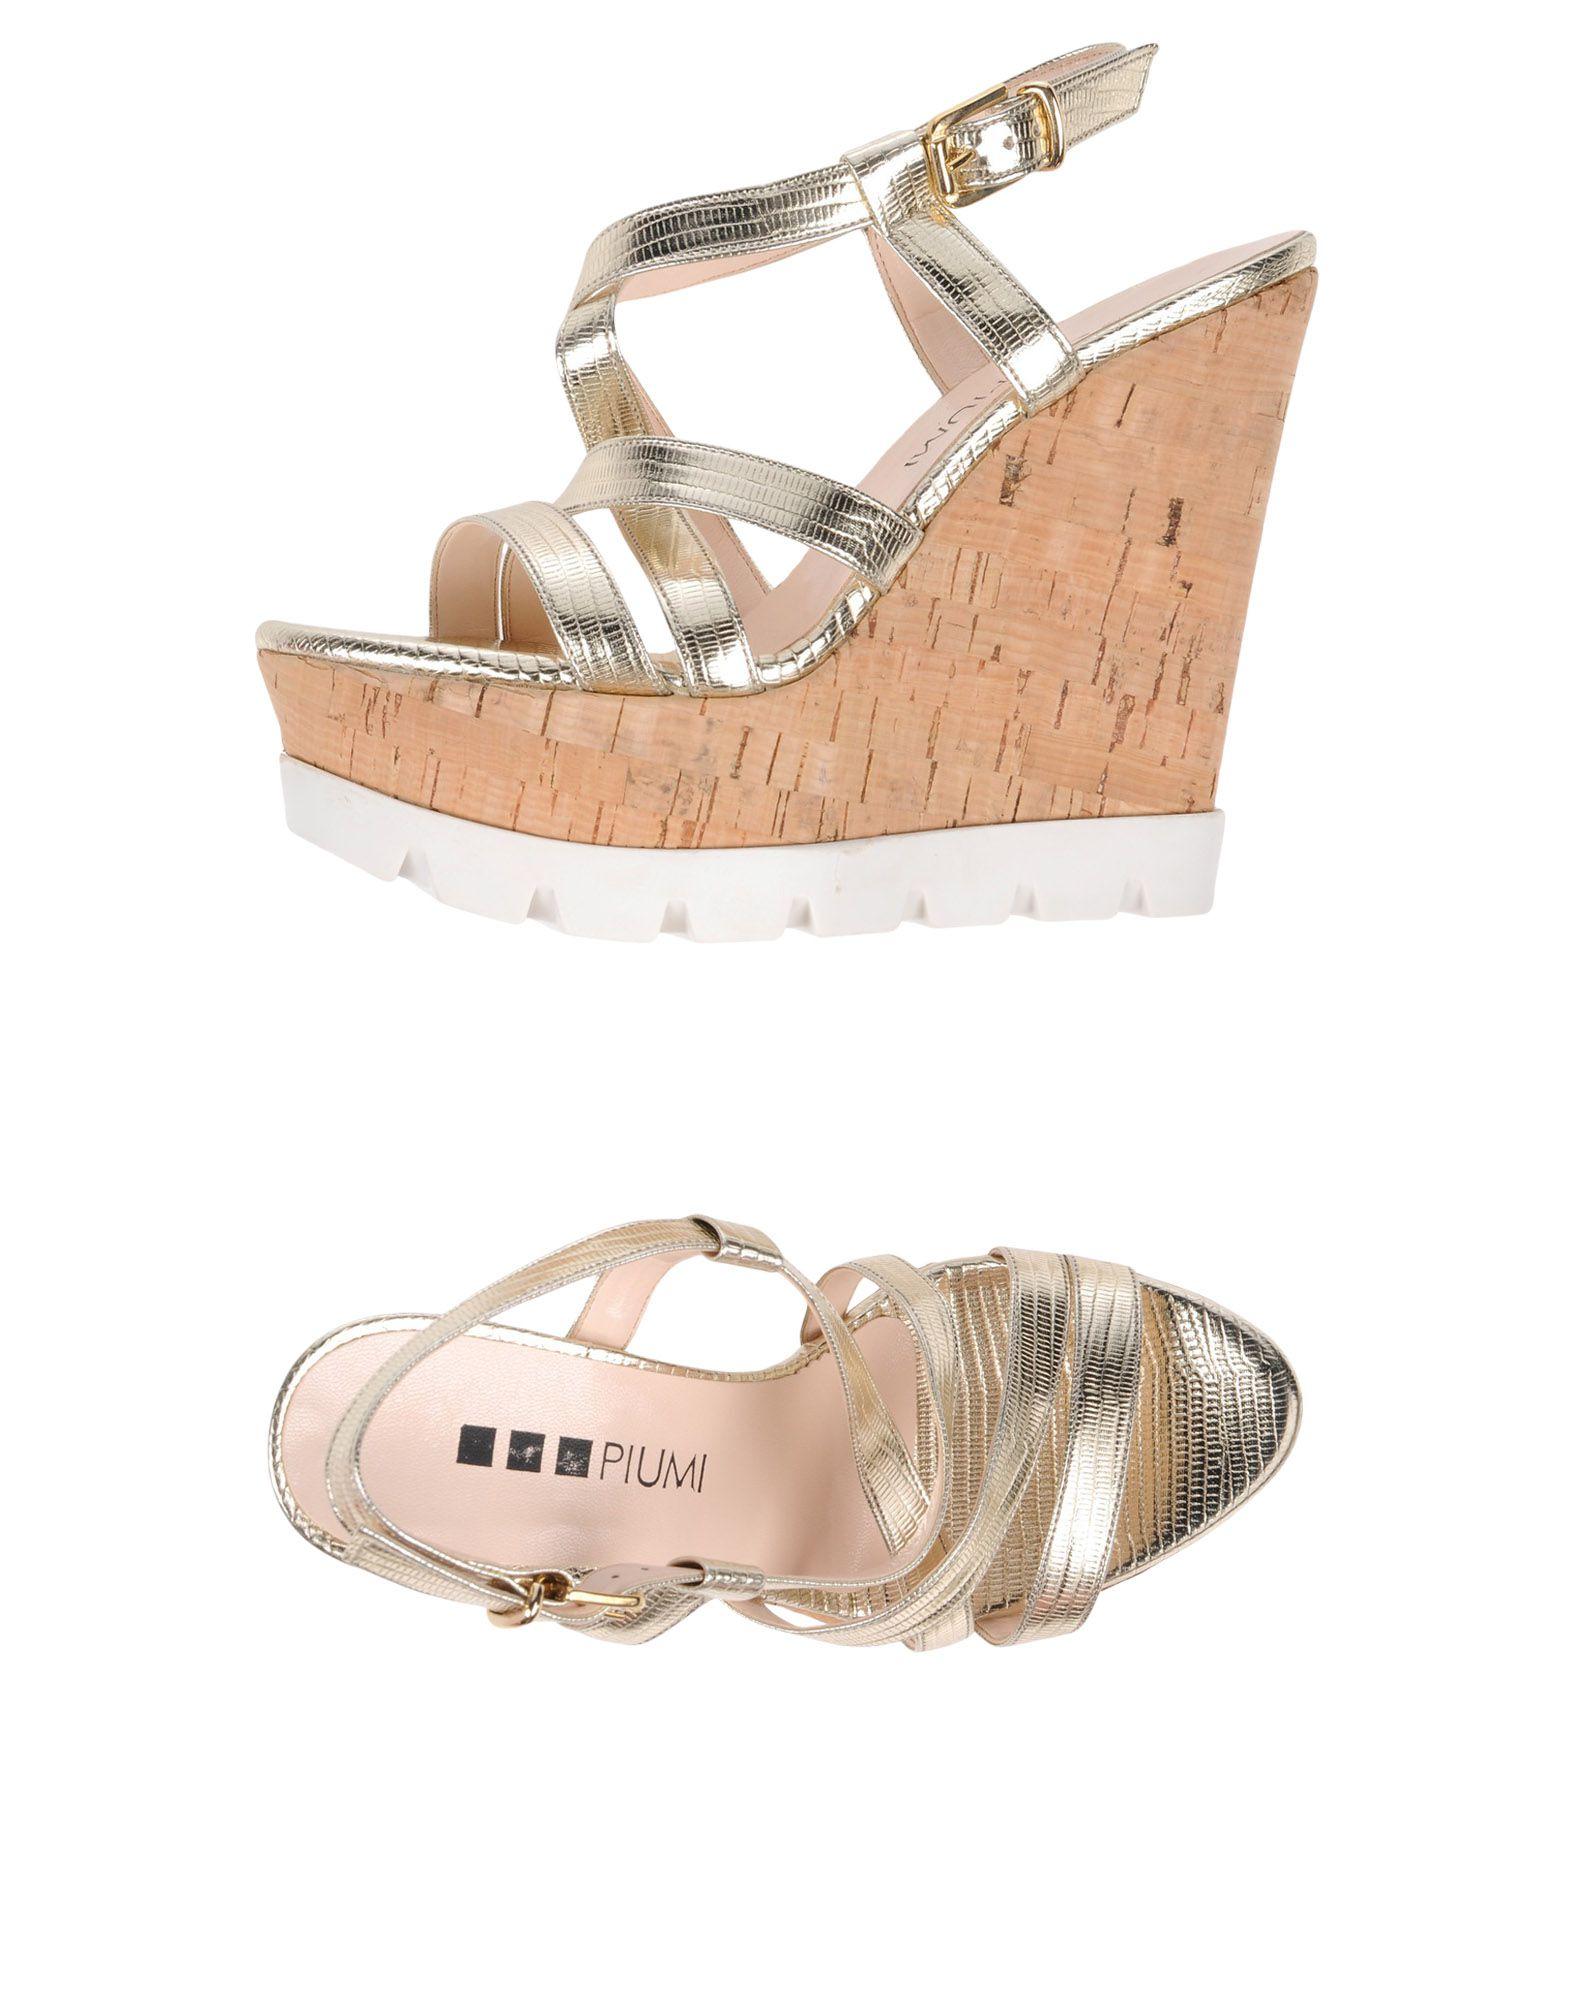 Moda Sandali Piumi Donna - - - 11458038OI 0d31a6